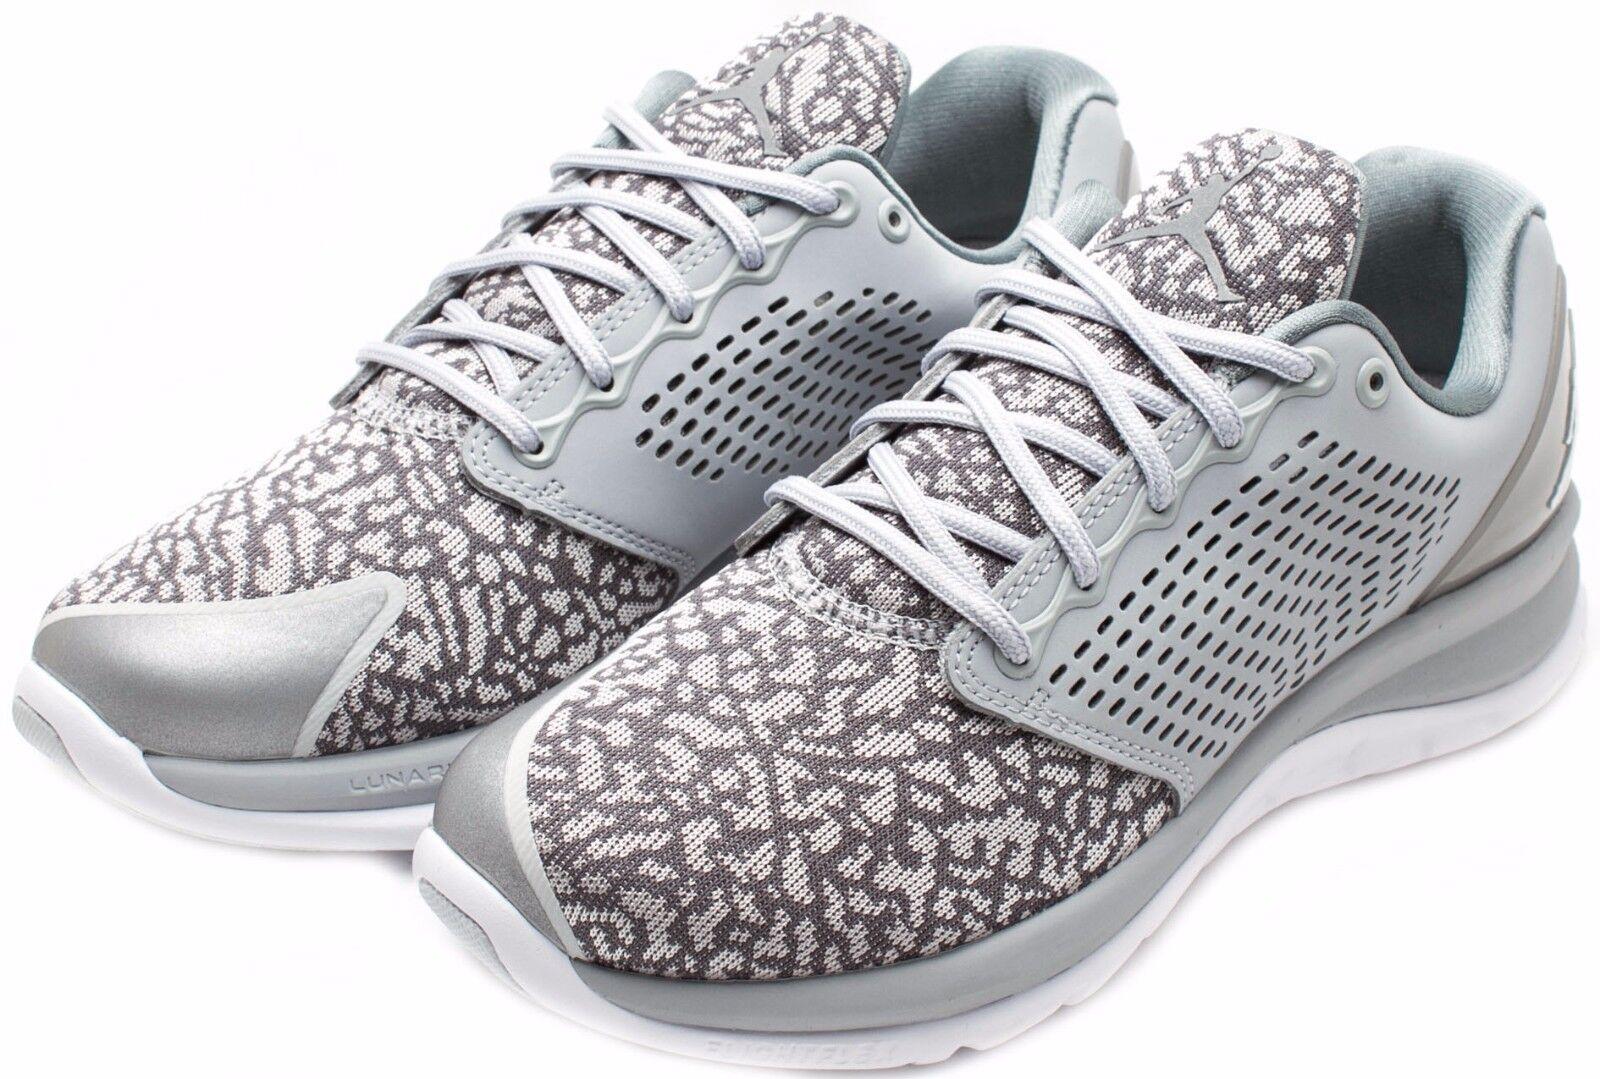 Nike Air Jordan Trainer ST Training Shoes 820253-003 White/Grey Sz 8 9 Scarpe classiche da uomo